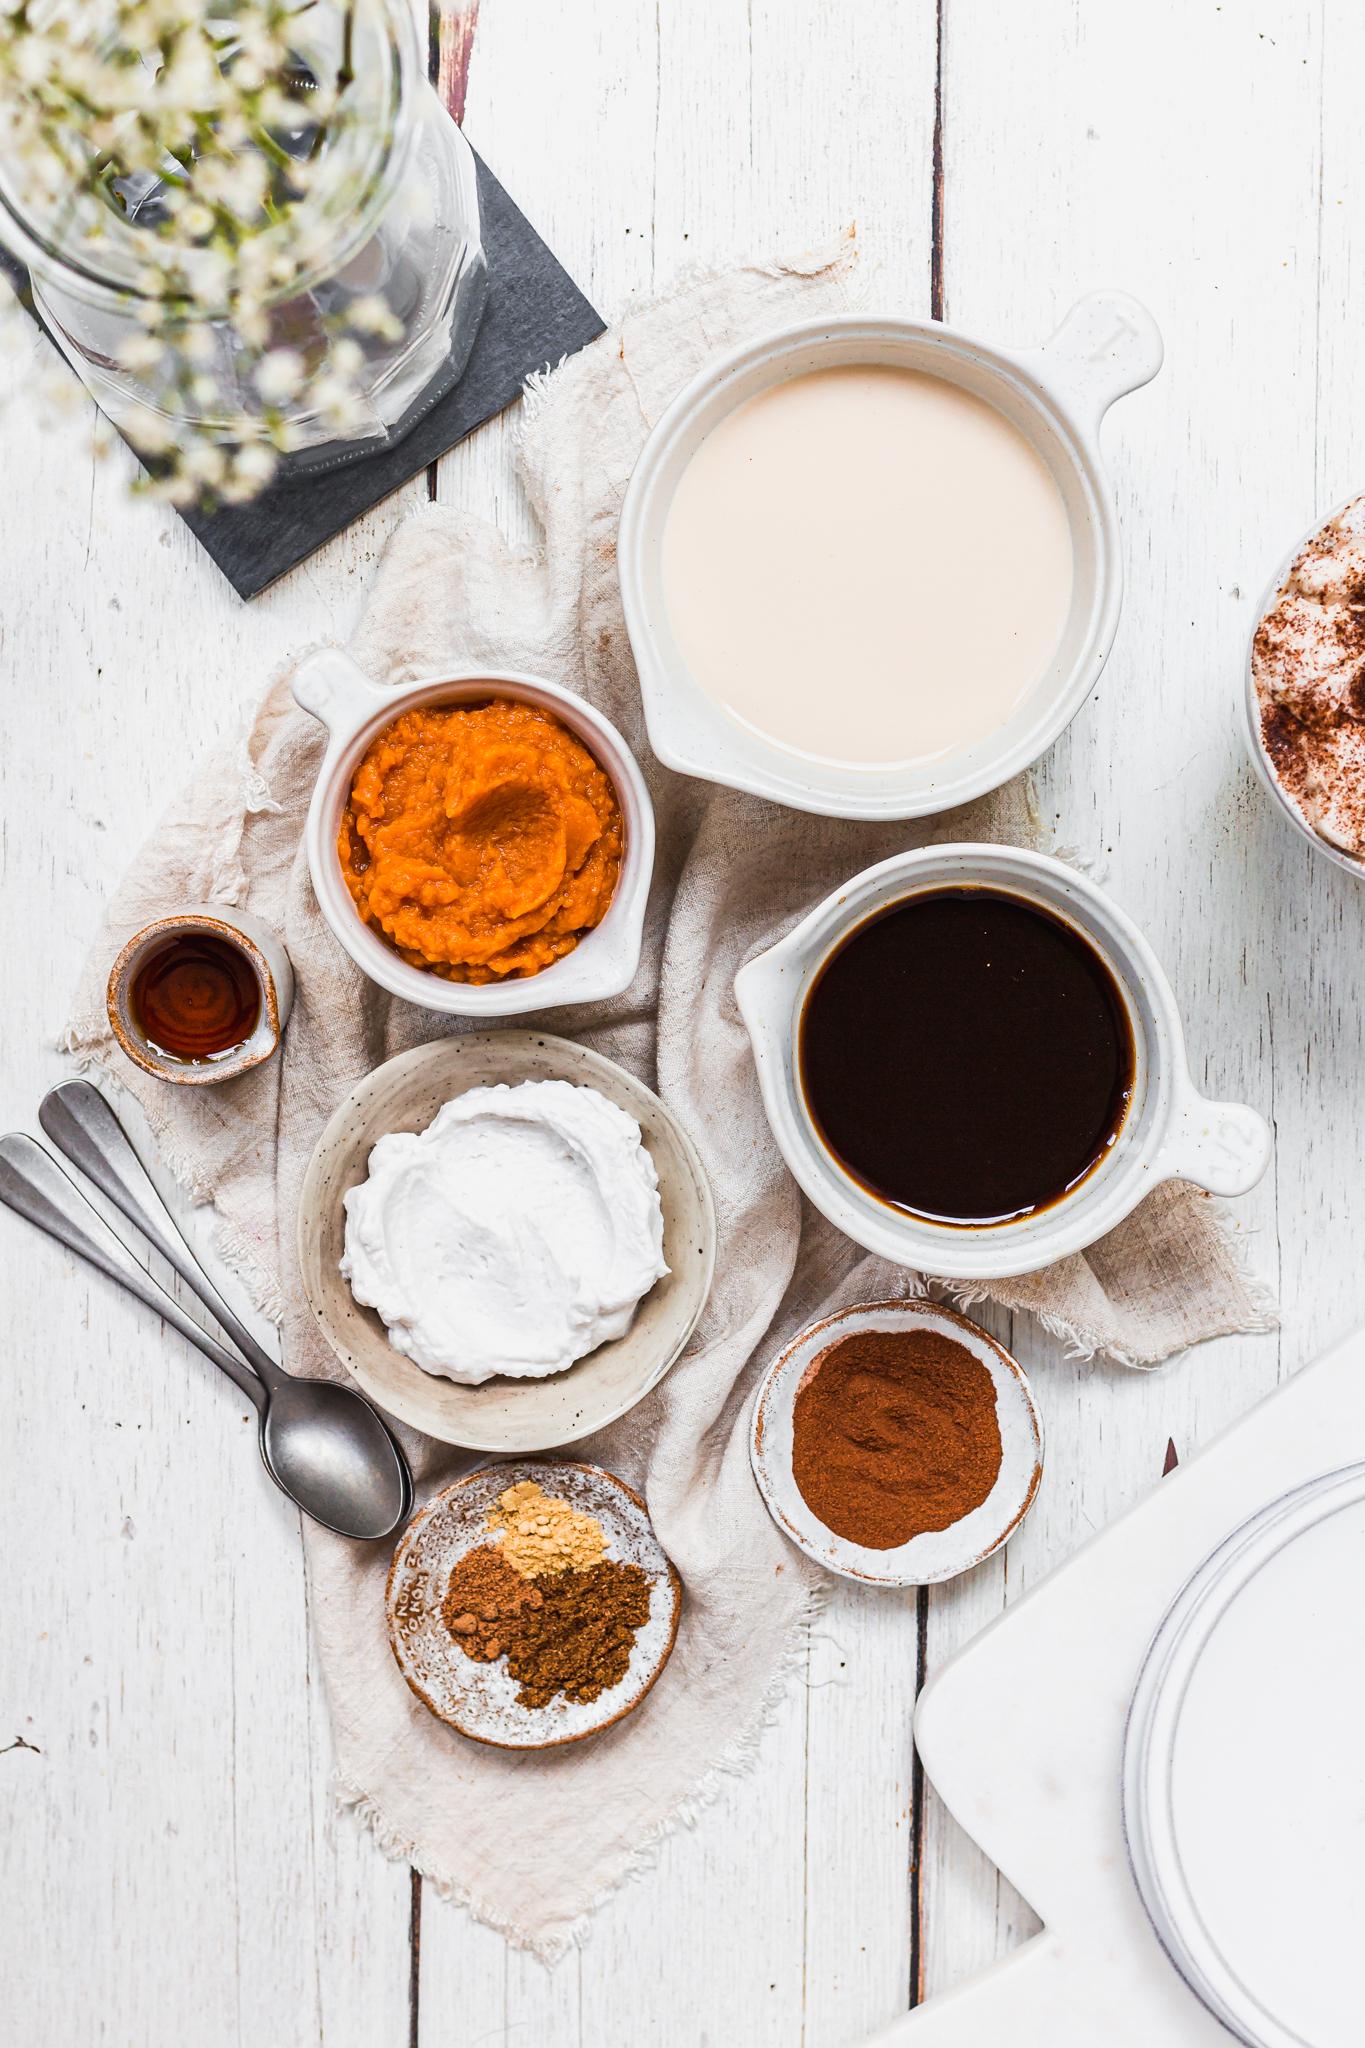 Measuring out pumpkin-spiced ingredients in Bybrook measuring cups